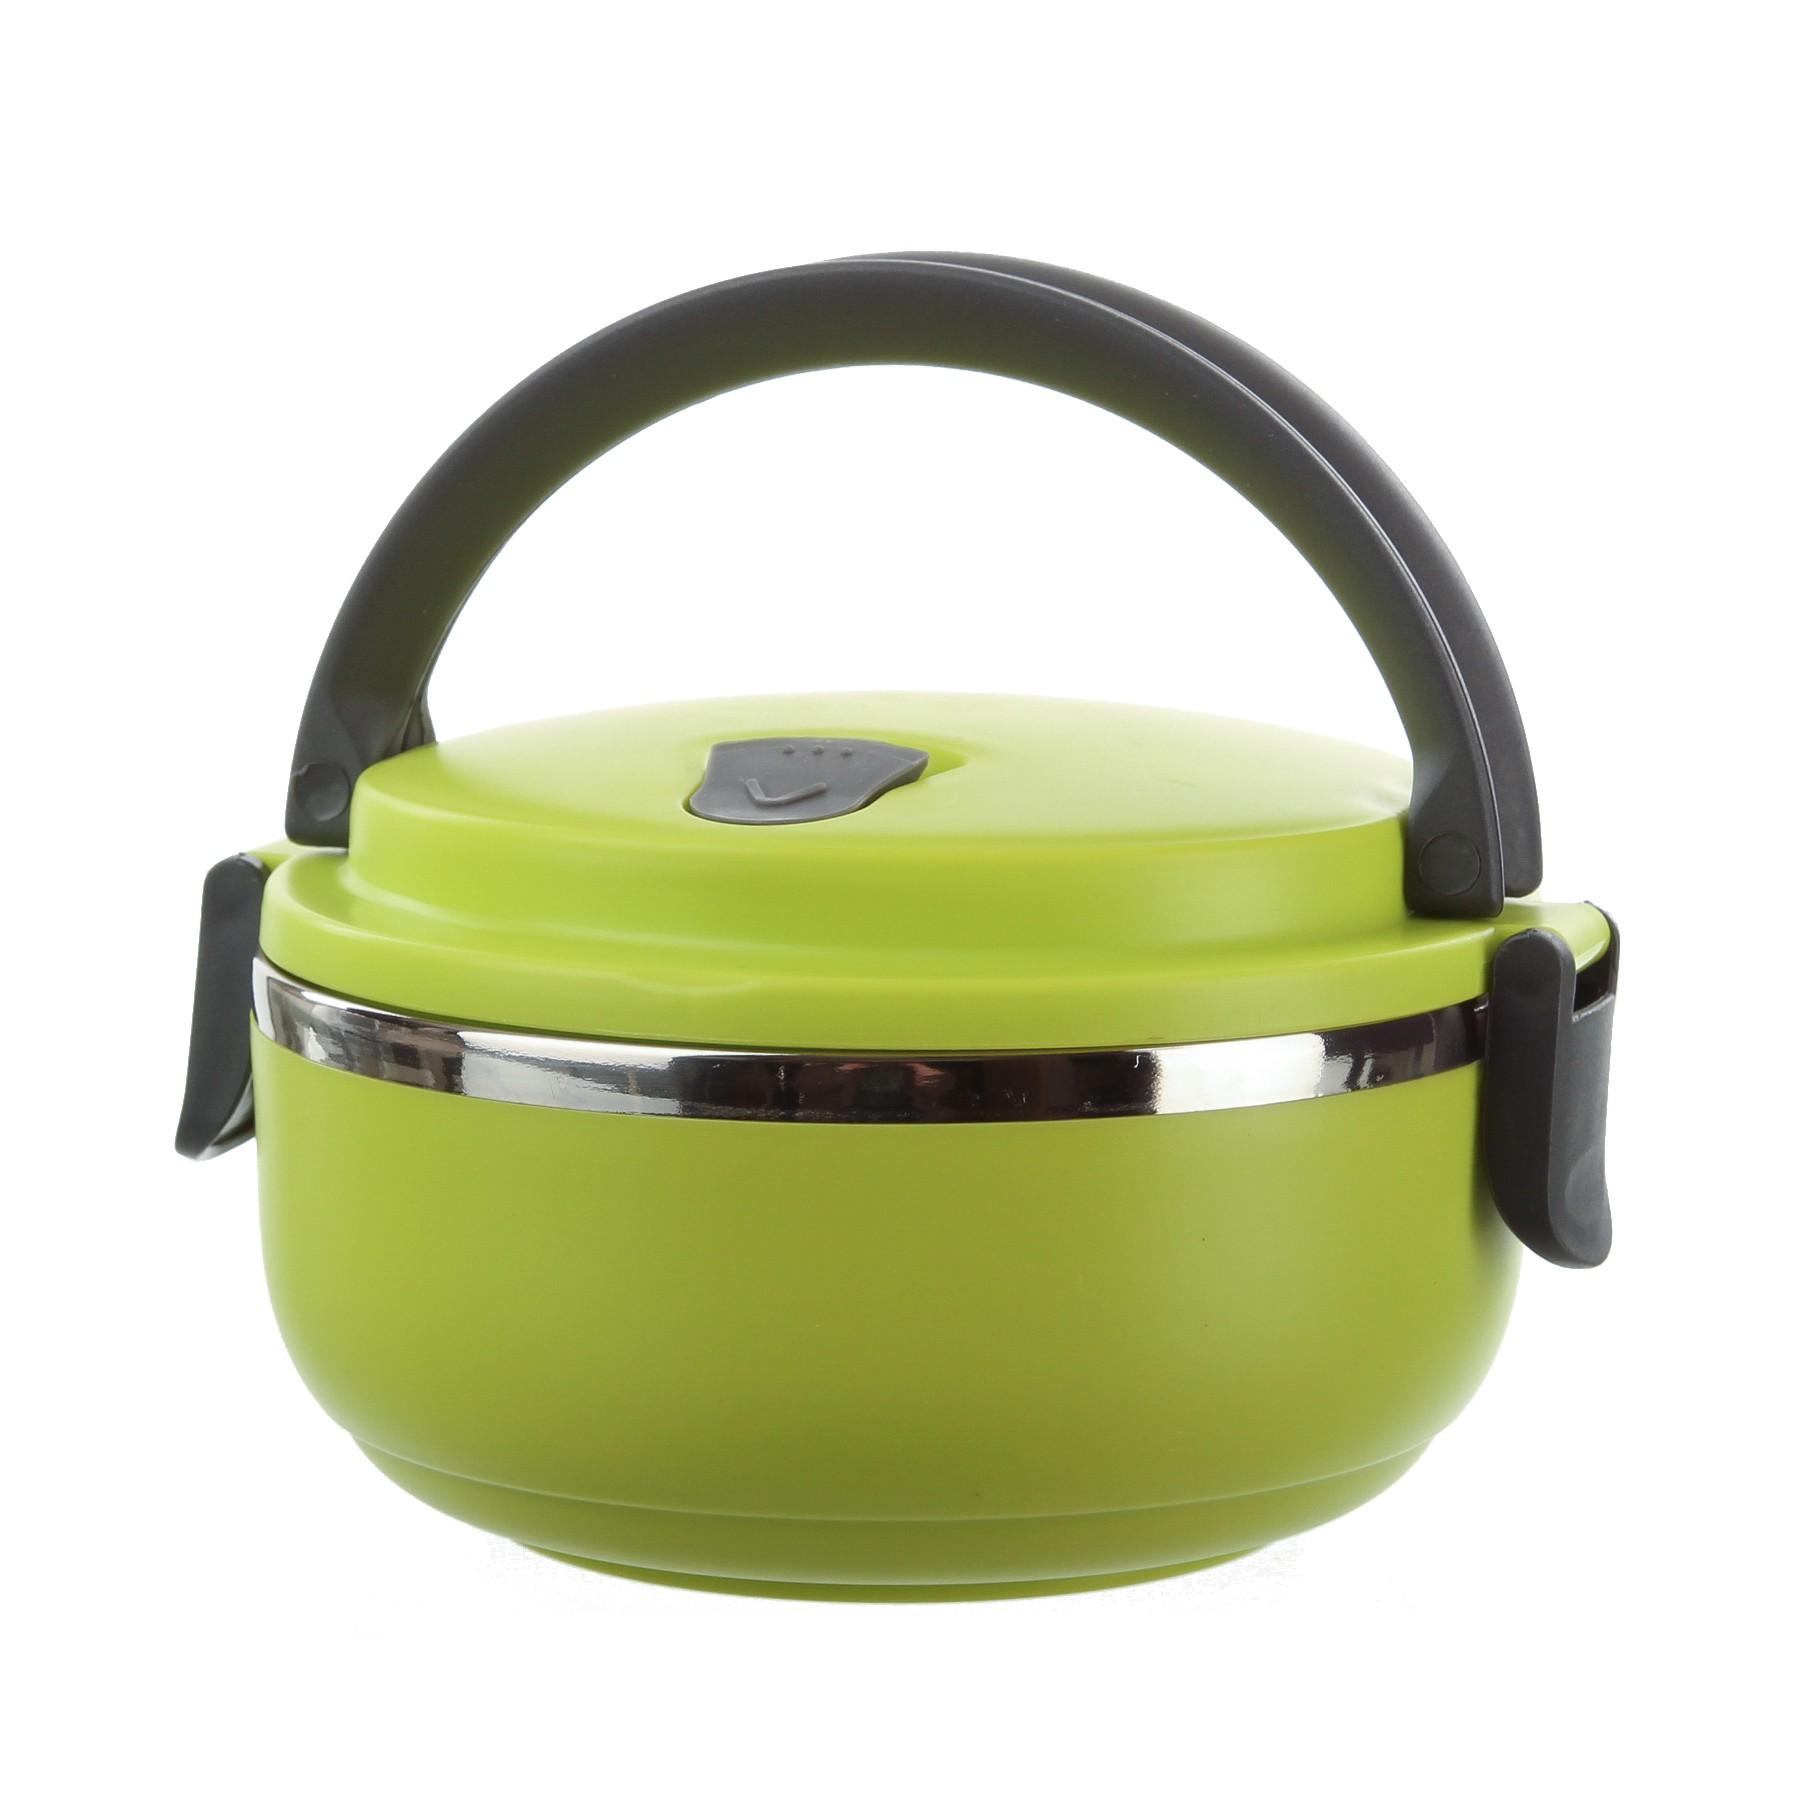 Suppen Lunch Box mit Deckel Bild https://cdn03.plentymarkets.com/zsy4vjx32p87/item/images/5029/full/13047-ama-07.JPG